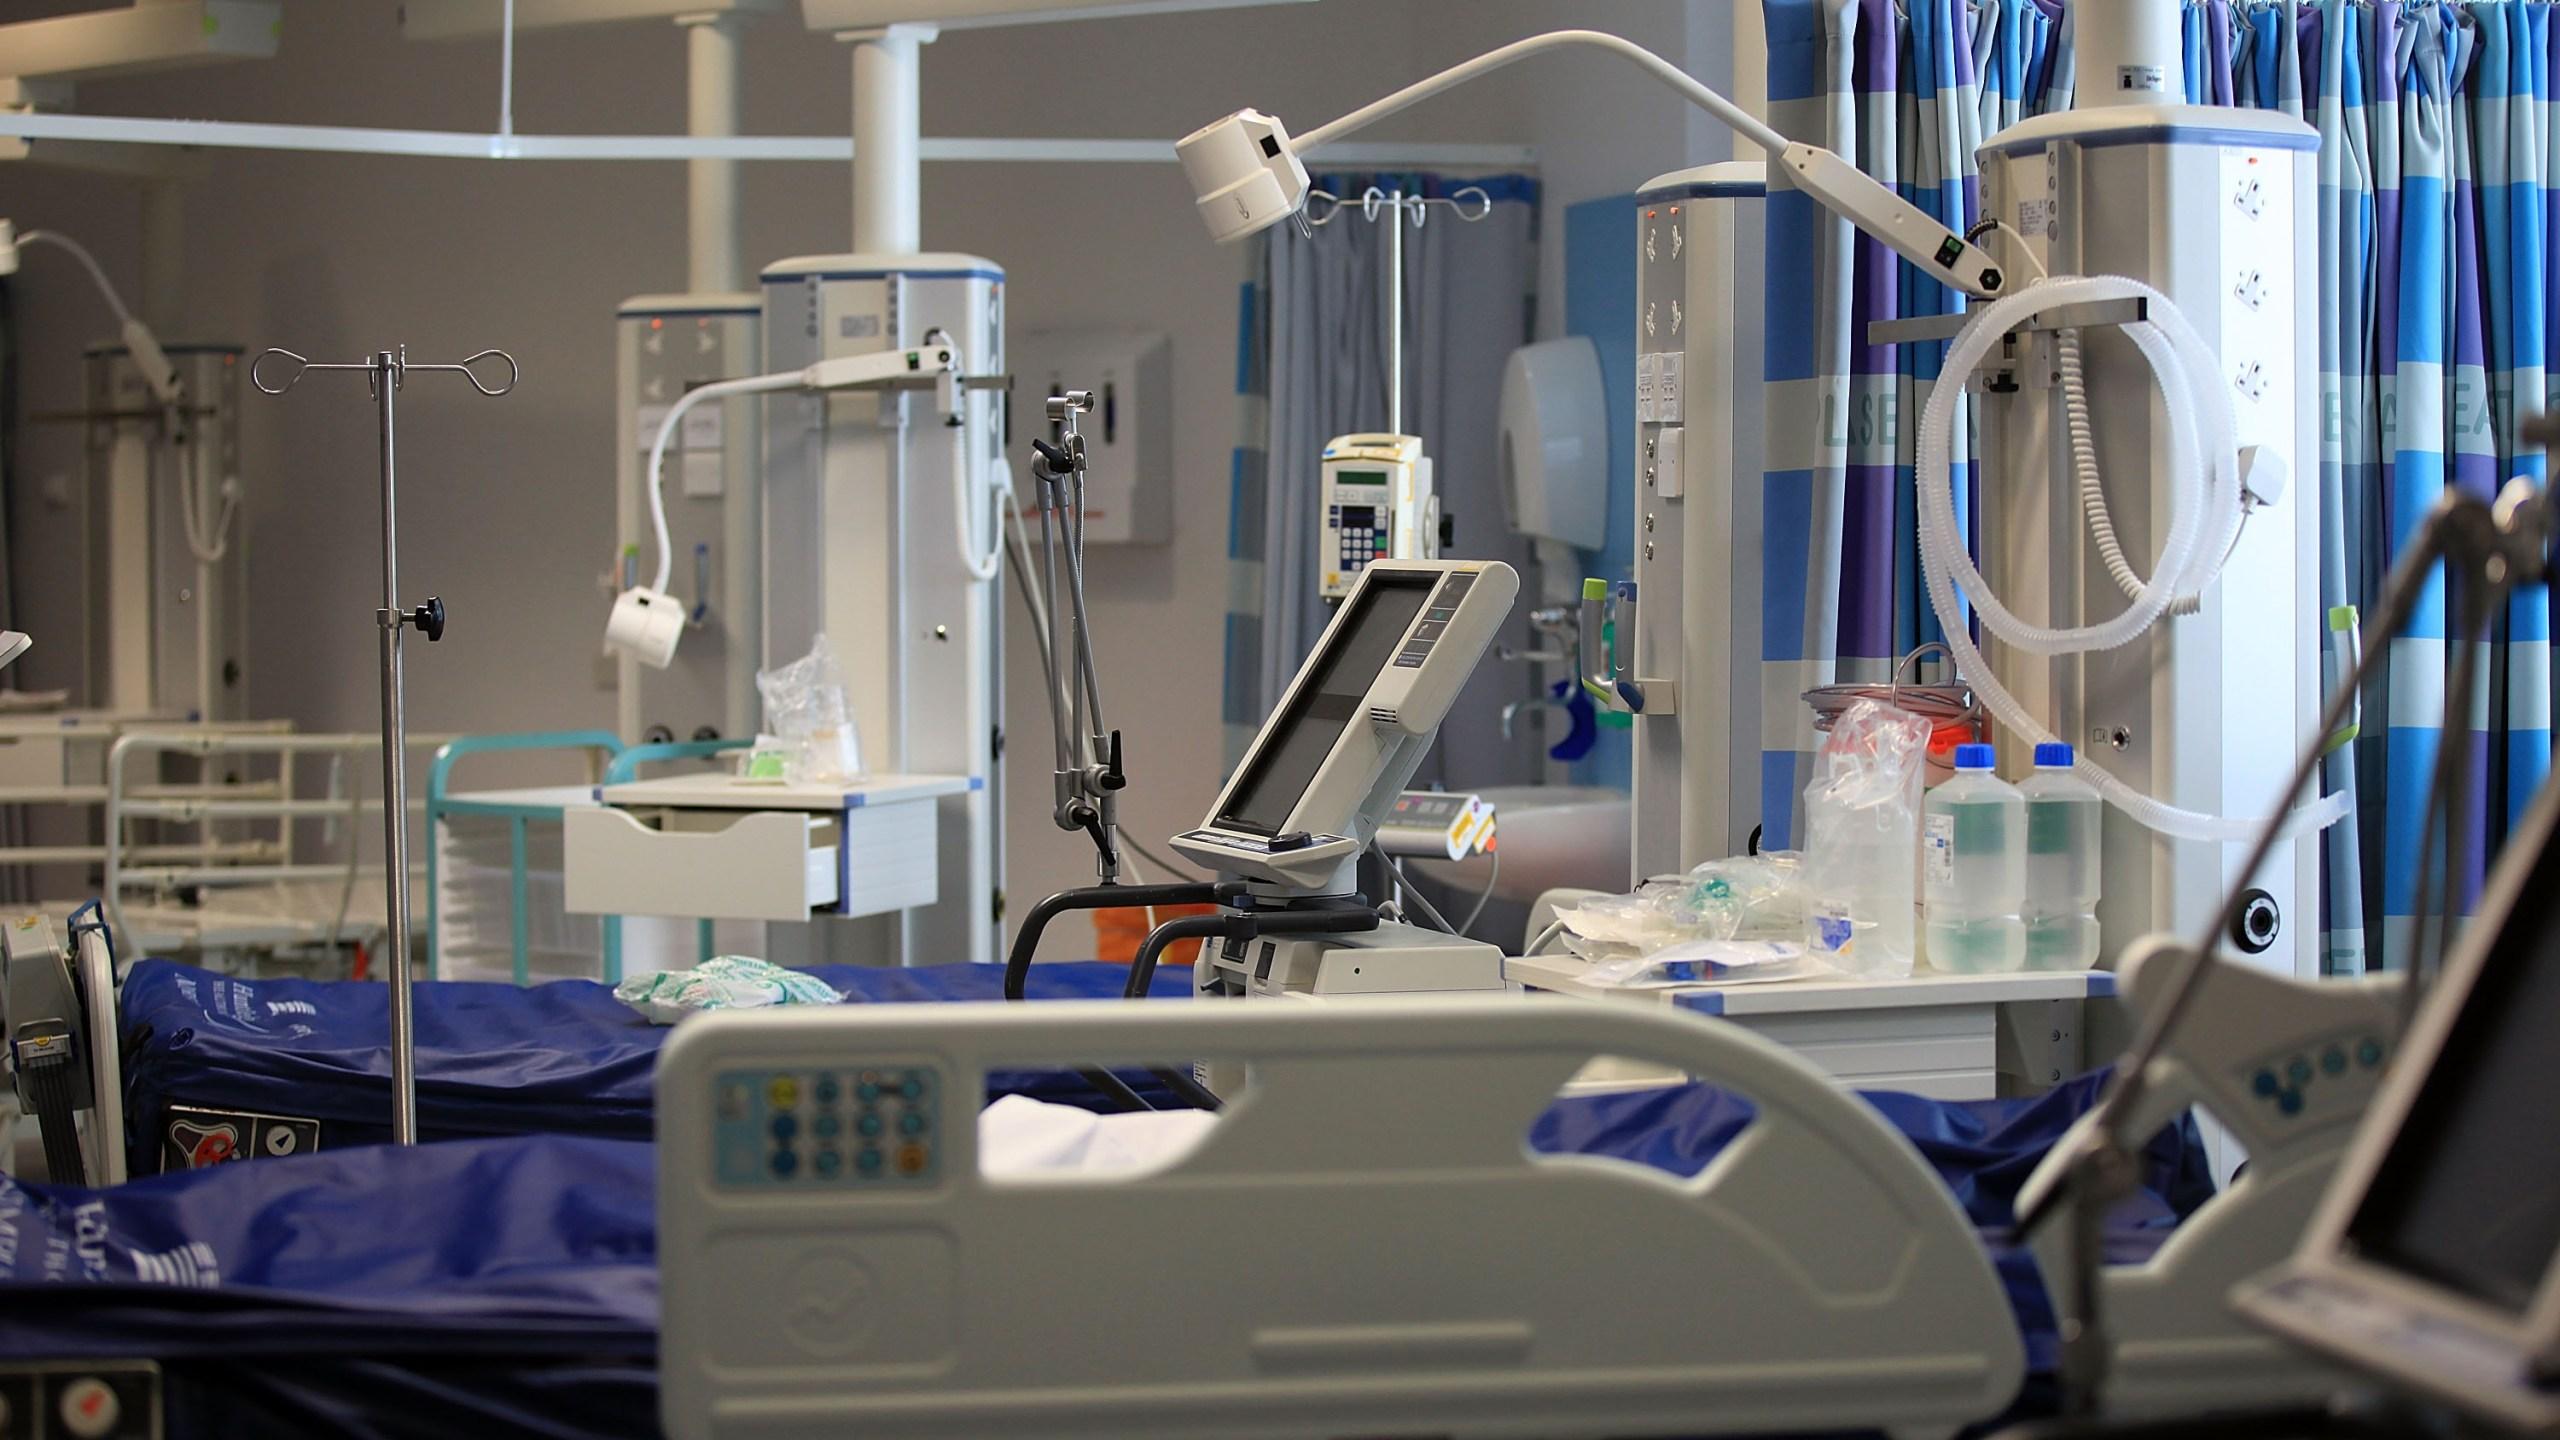 Hospital_1546028511751